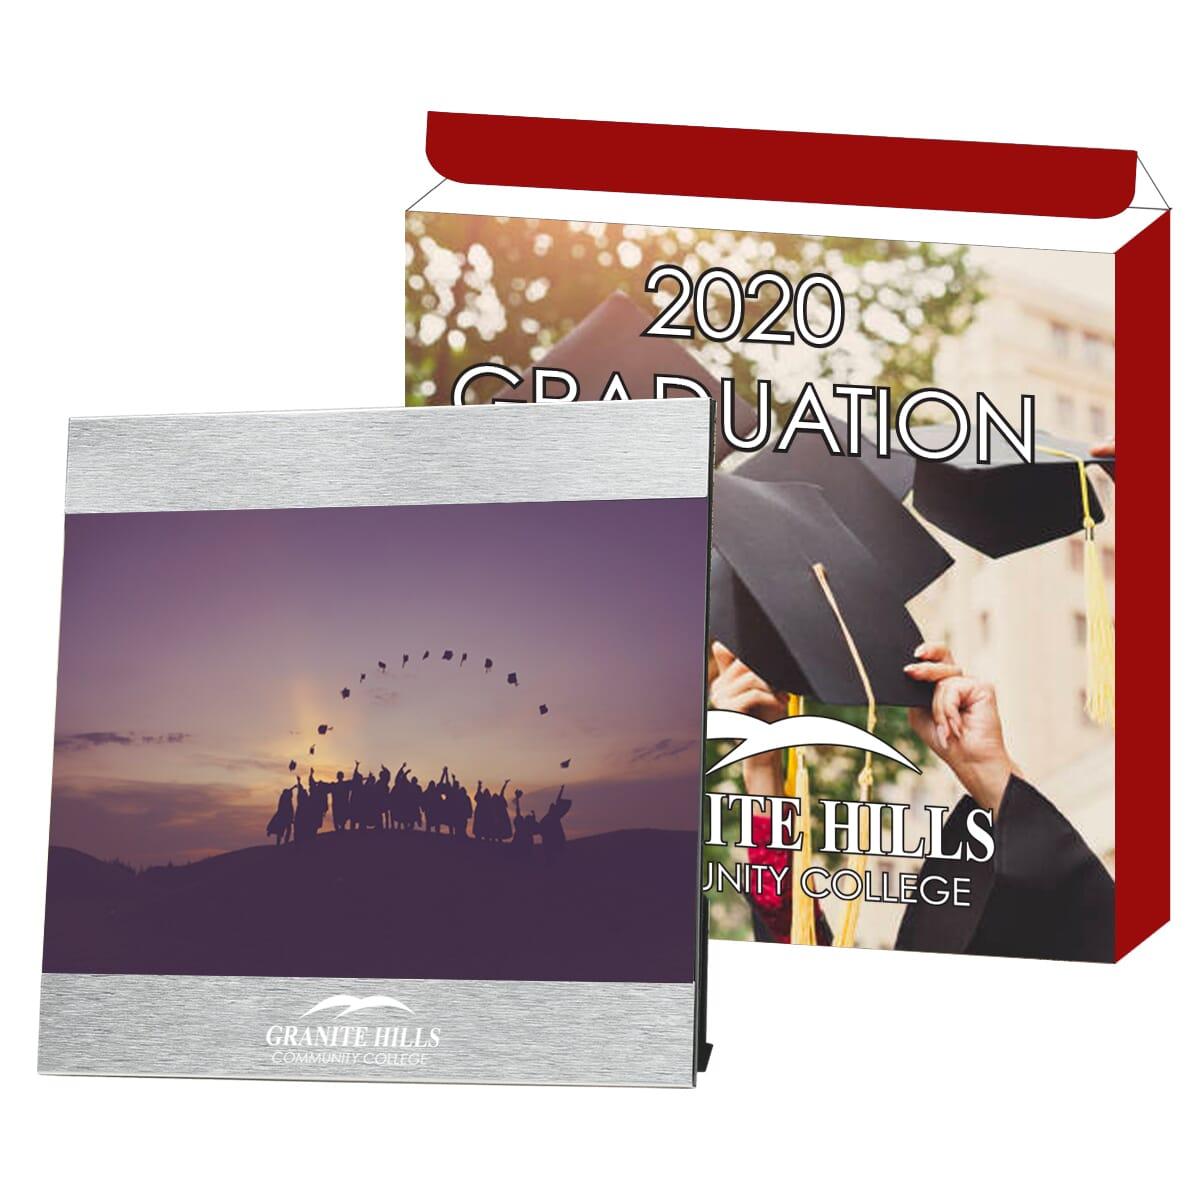 Photo frame and custom box for graduation